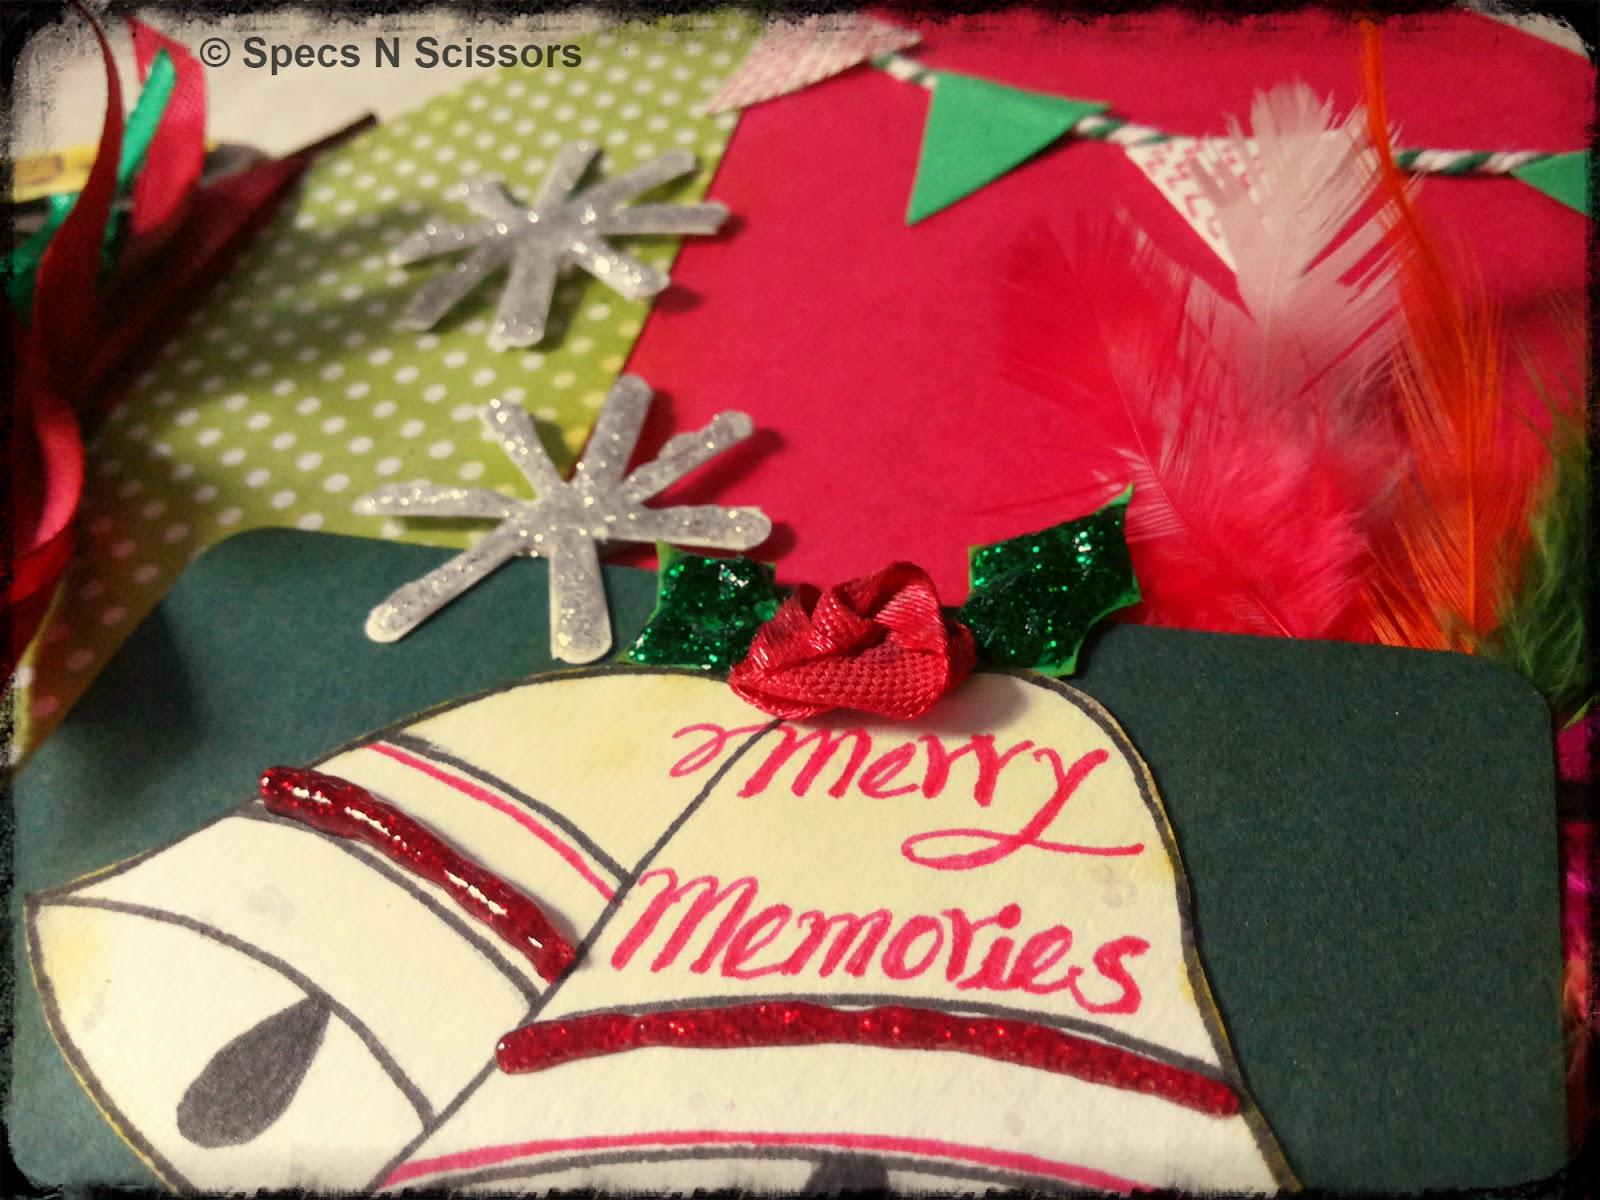 Specs N Scissors - Blog